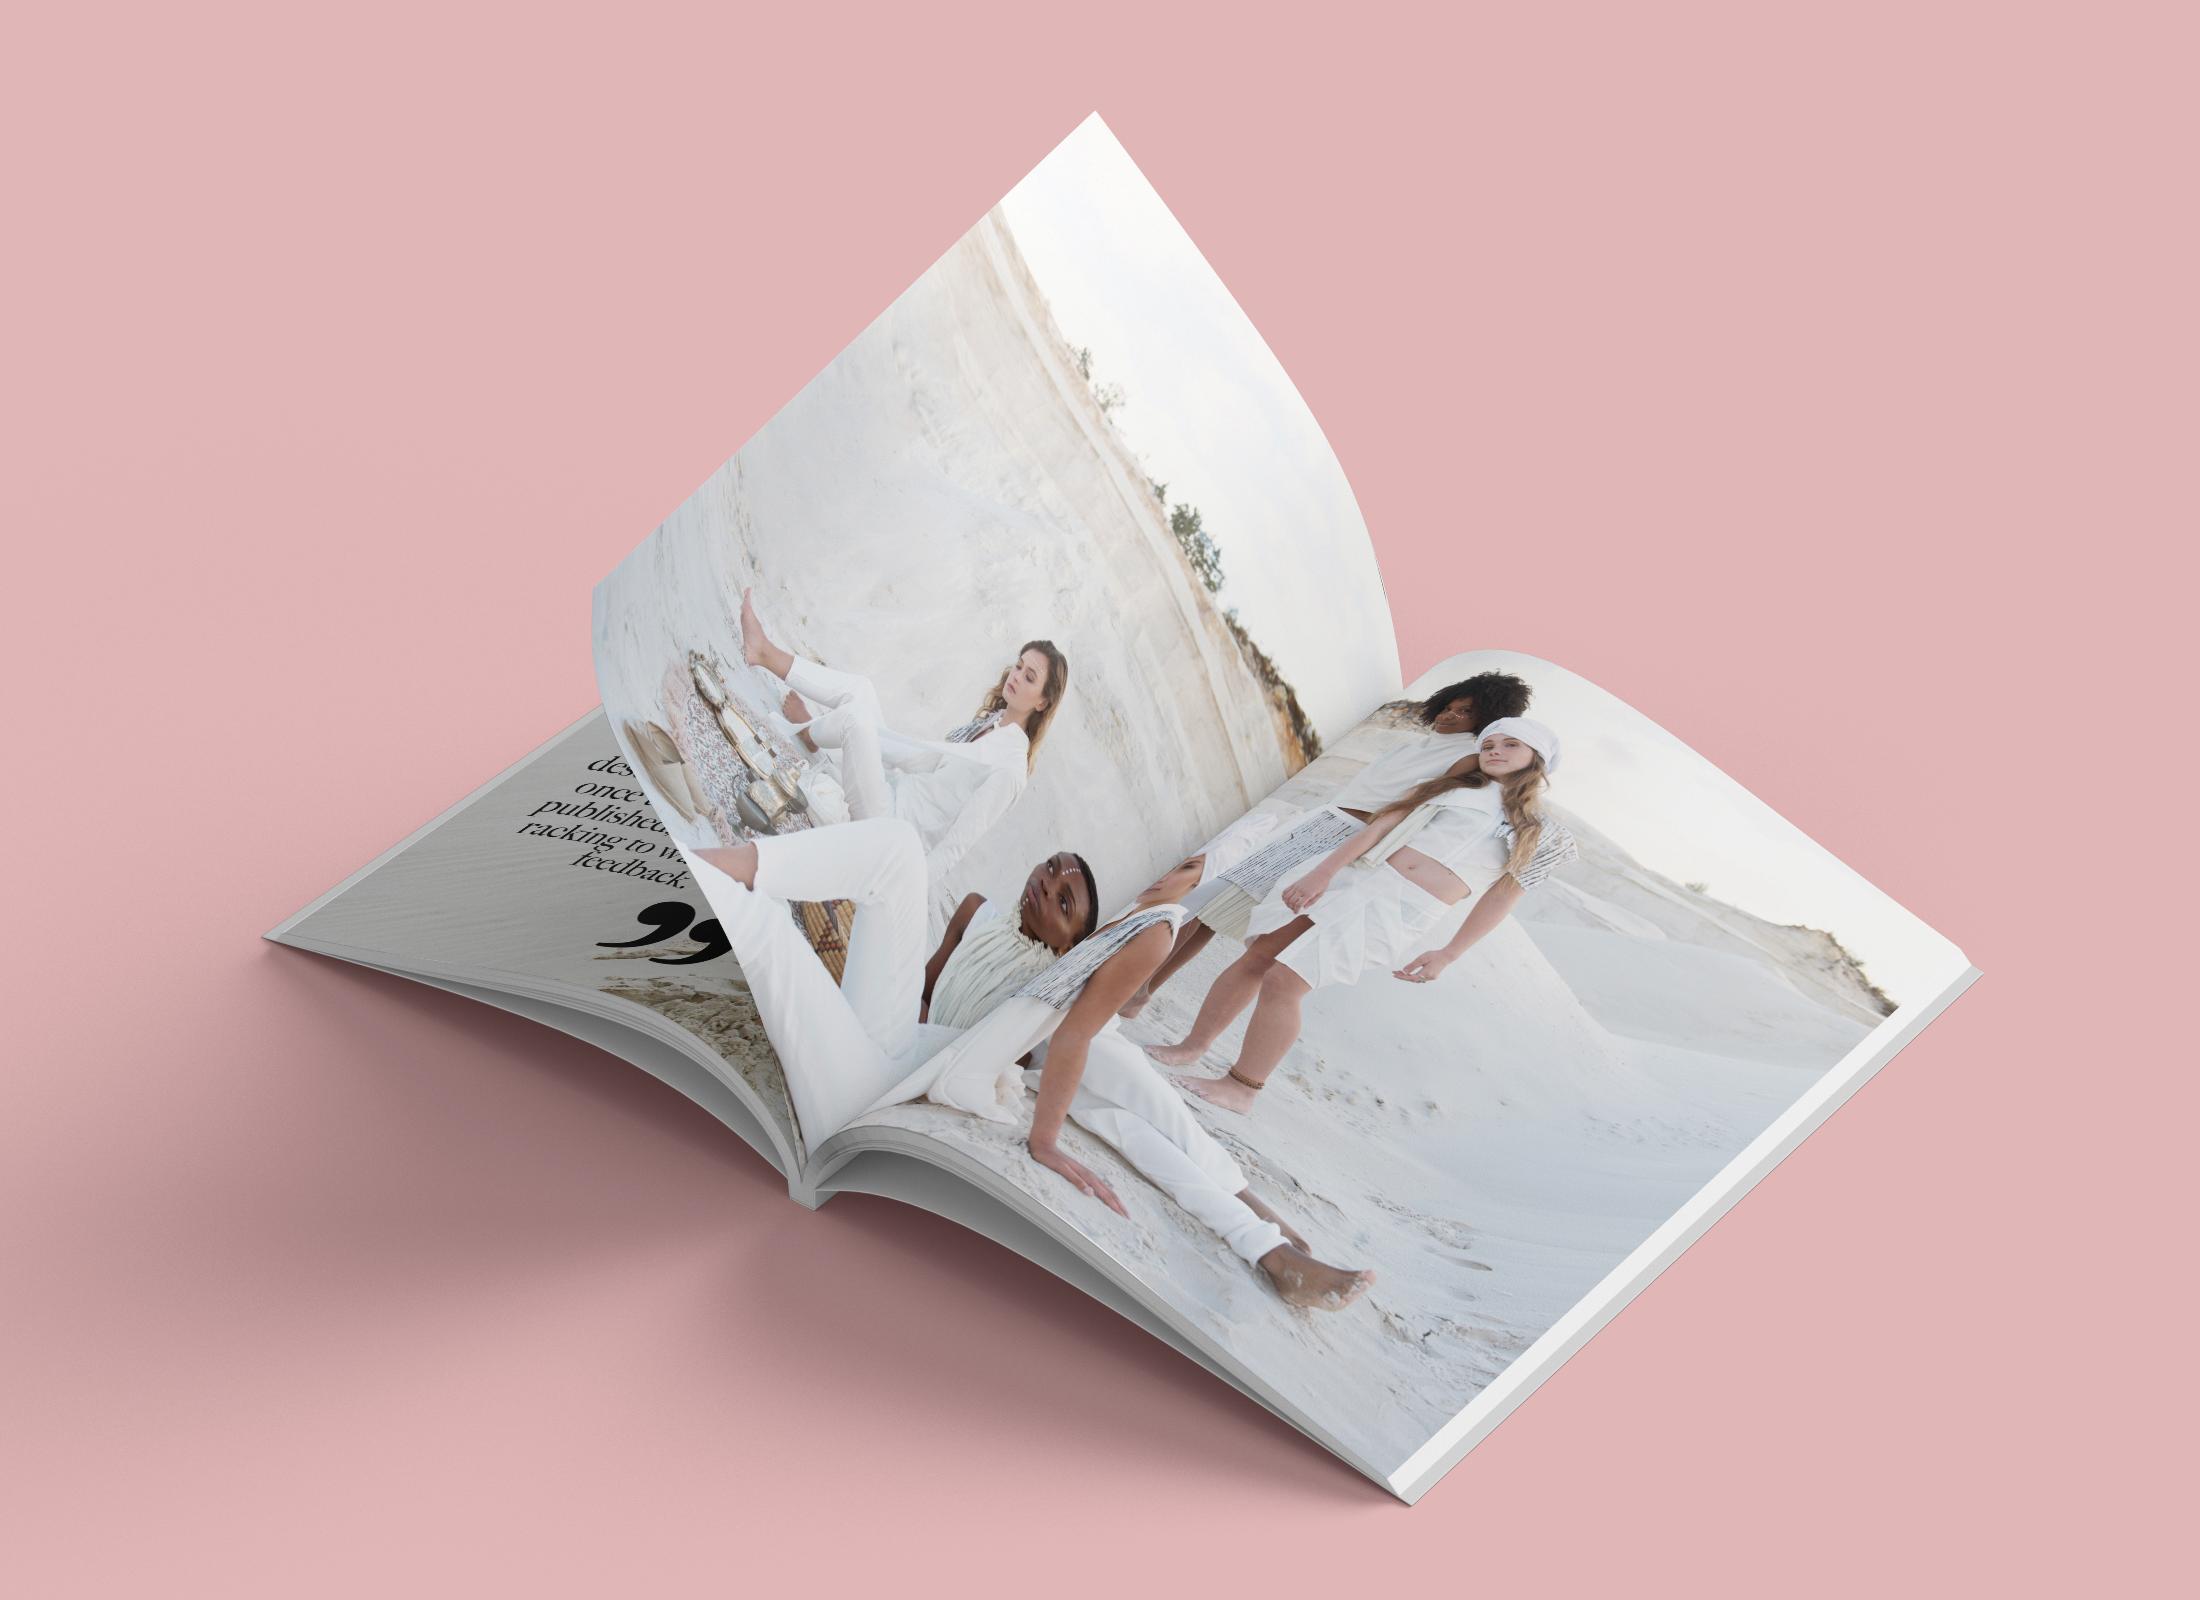 Model Citizen Magazine Issue 36, Macky Suson, Fashion Inclusion Now1.png